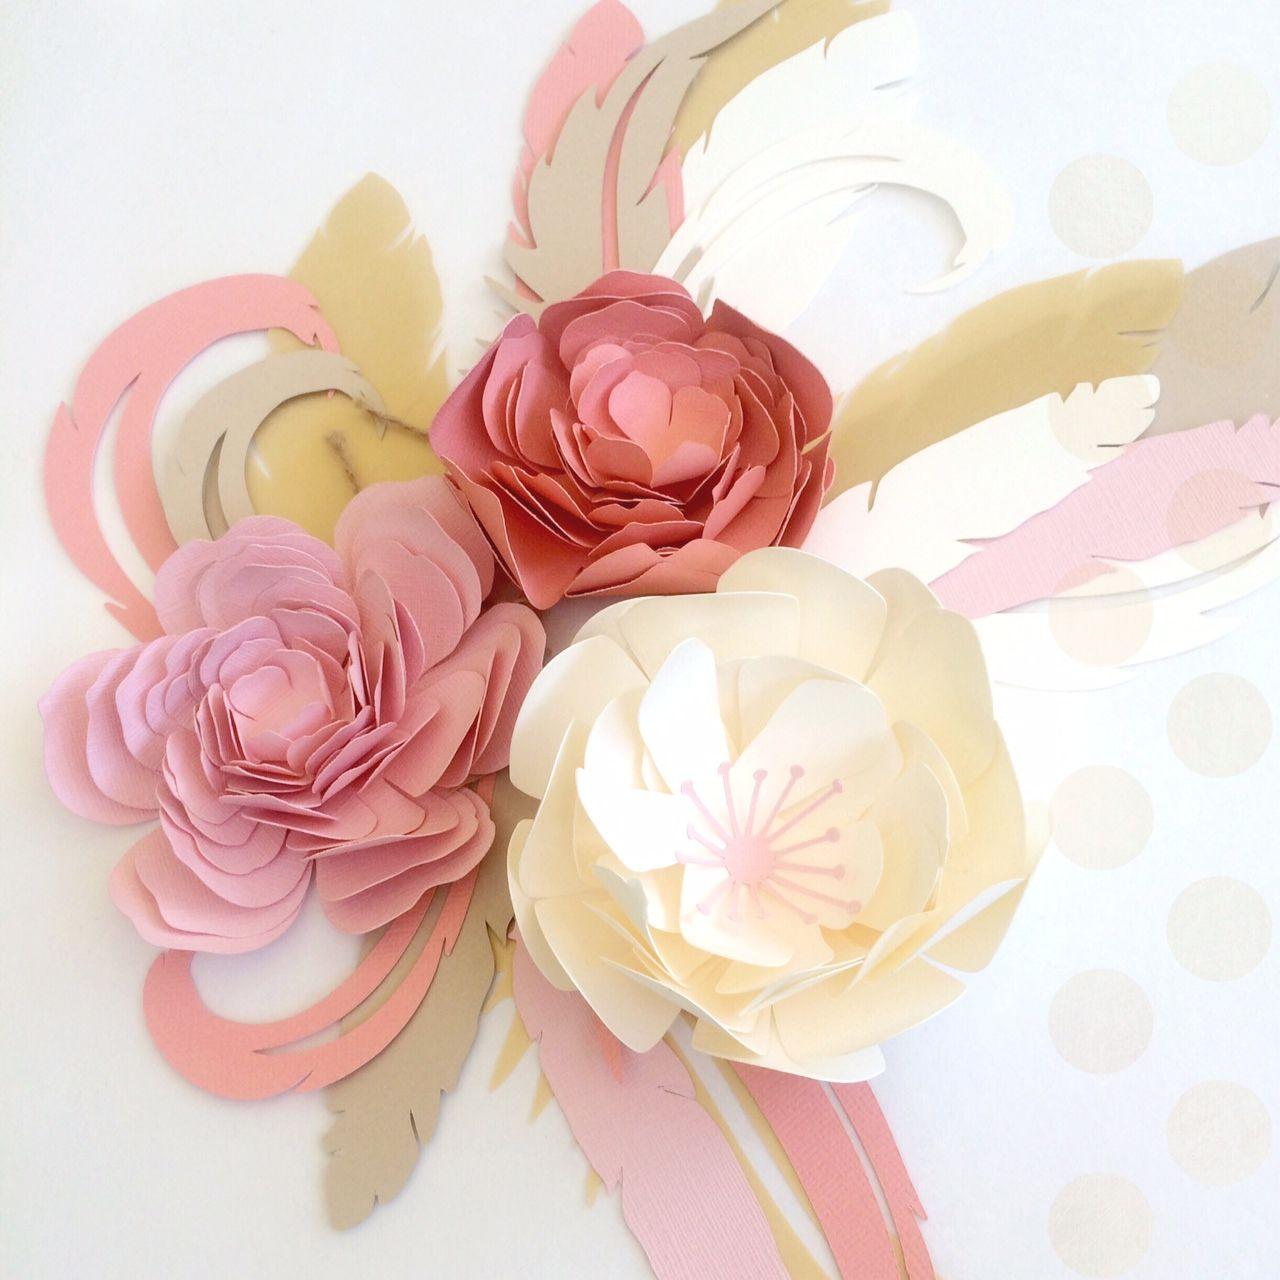 Large Paper Flower Backdrop Flowers Pinterest Flower Flower